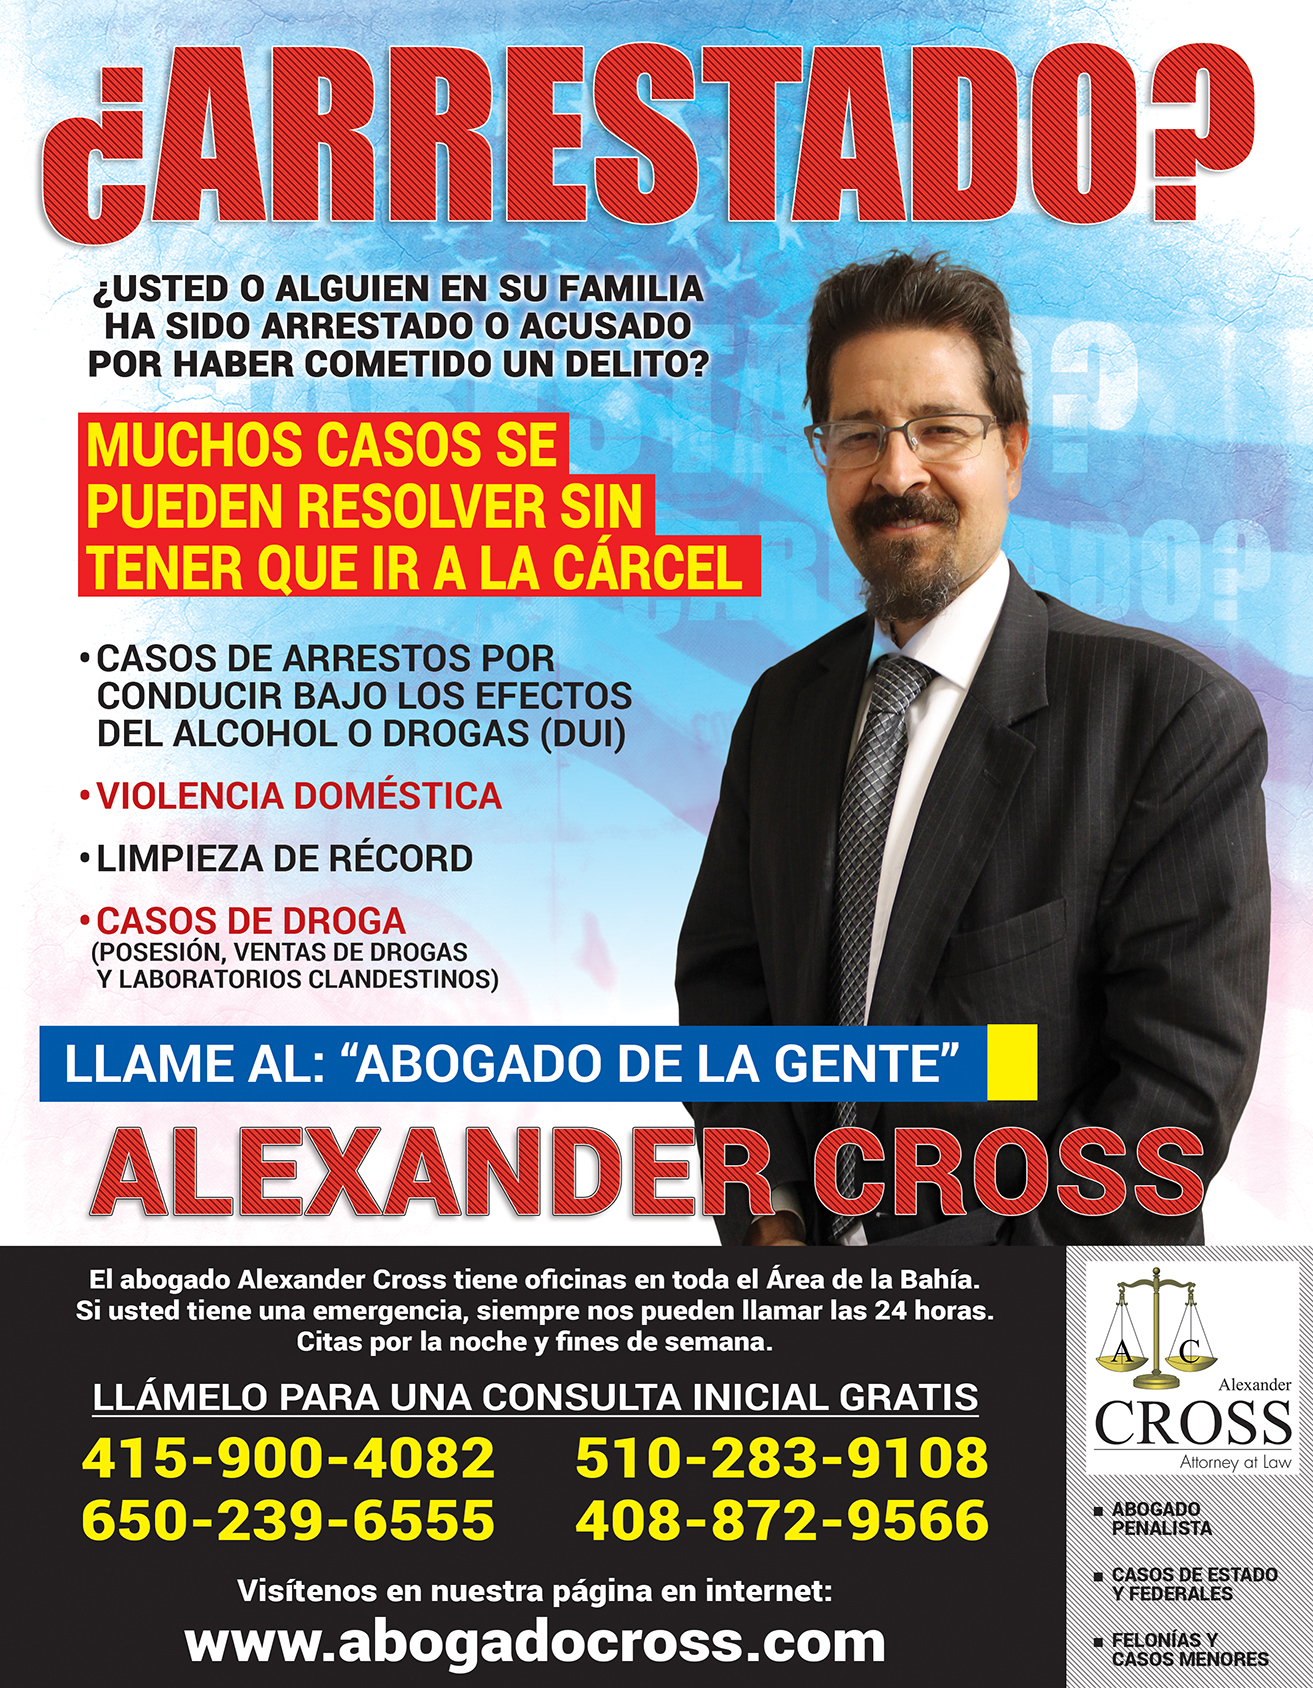 Alexander Cross 1pag GLOSSY OCTUBRE 2018.jpg